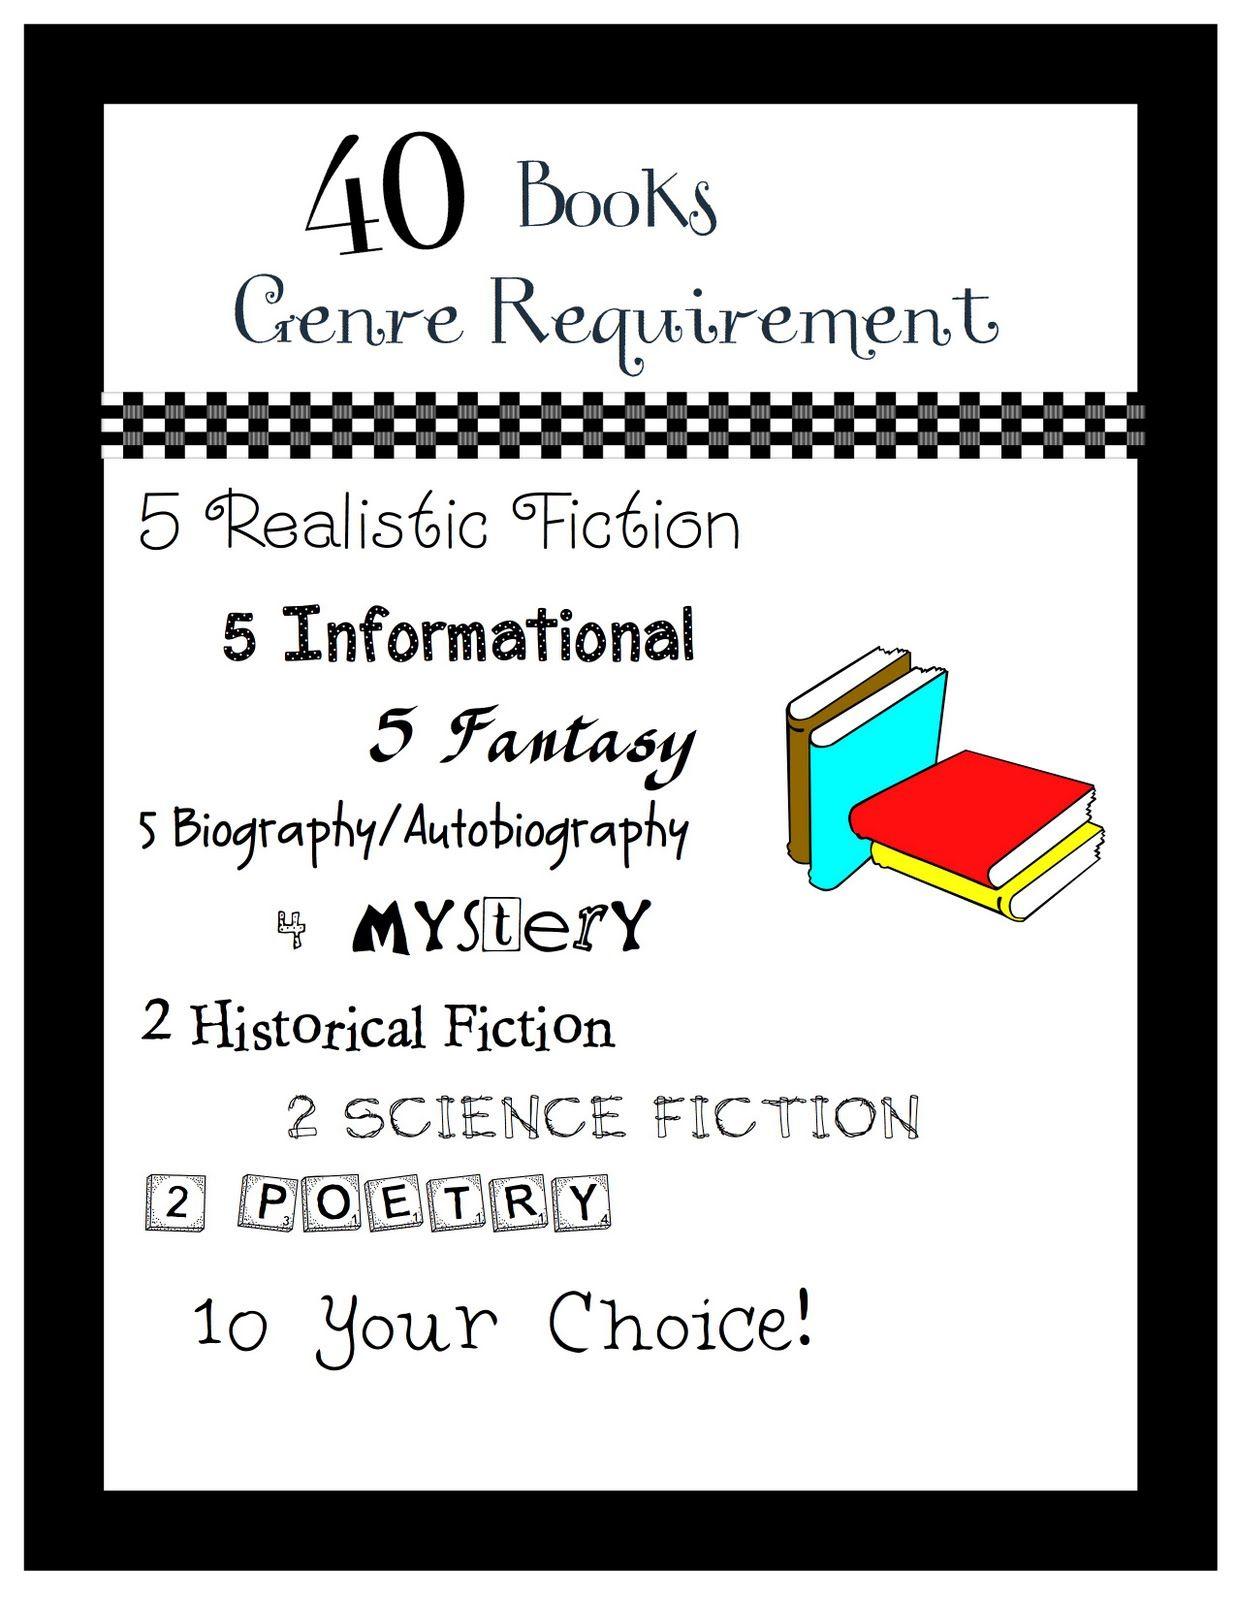 40 Books Genre Requirement